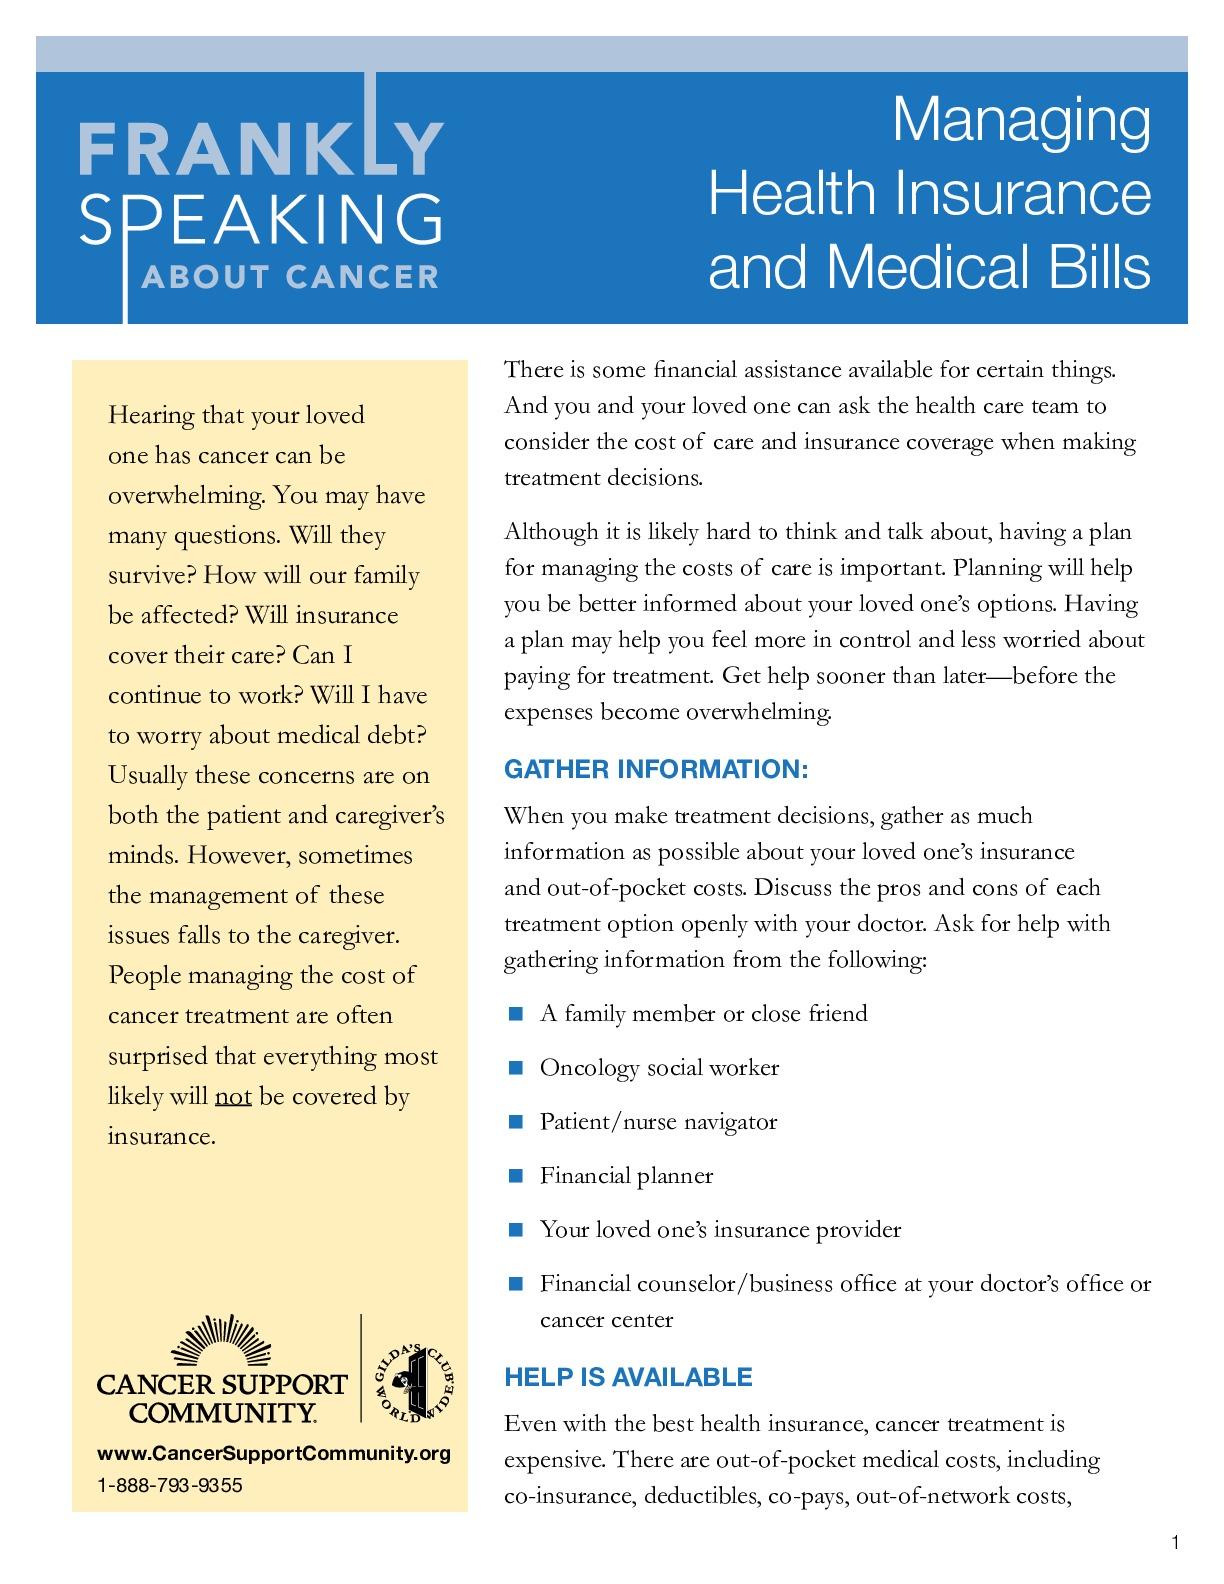 Managing Health Insurance